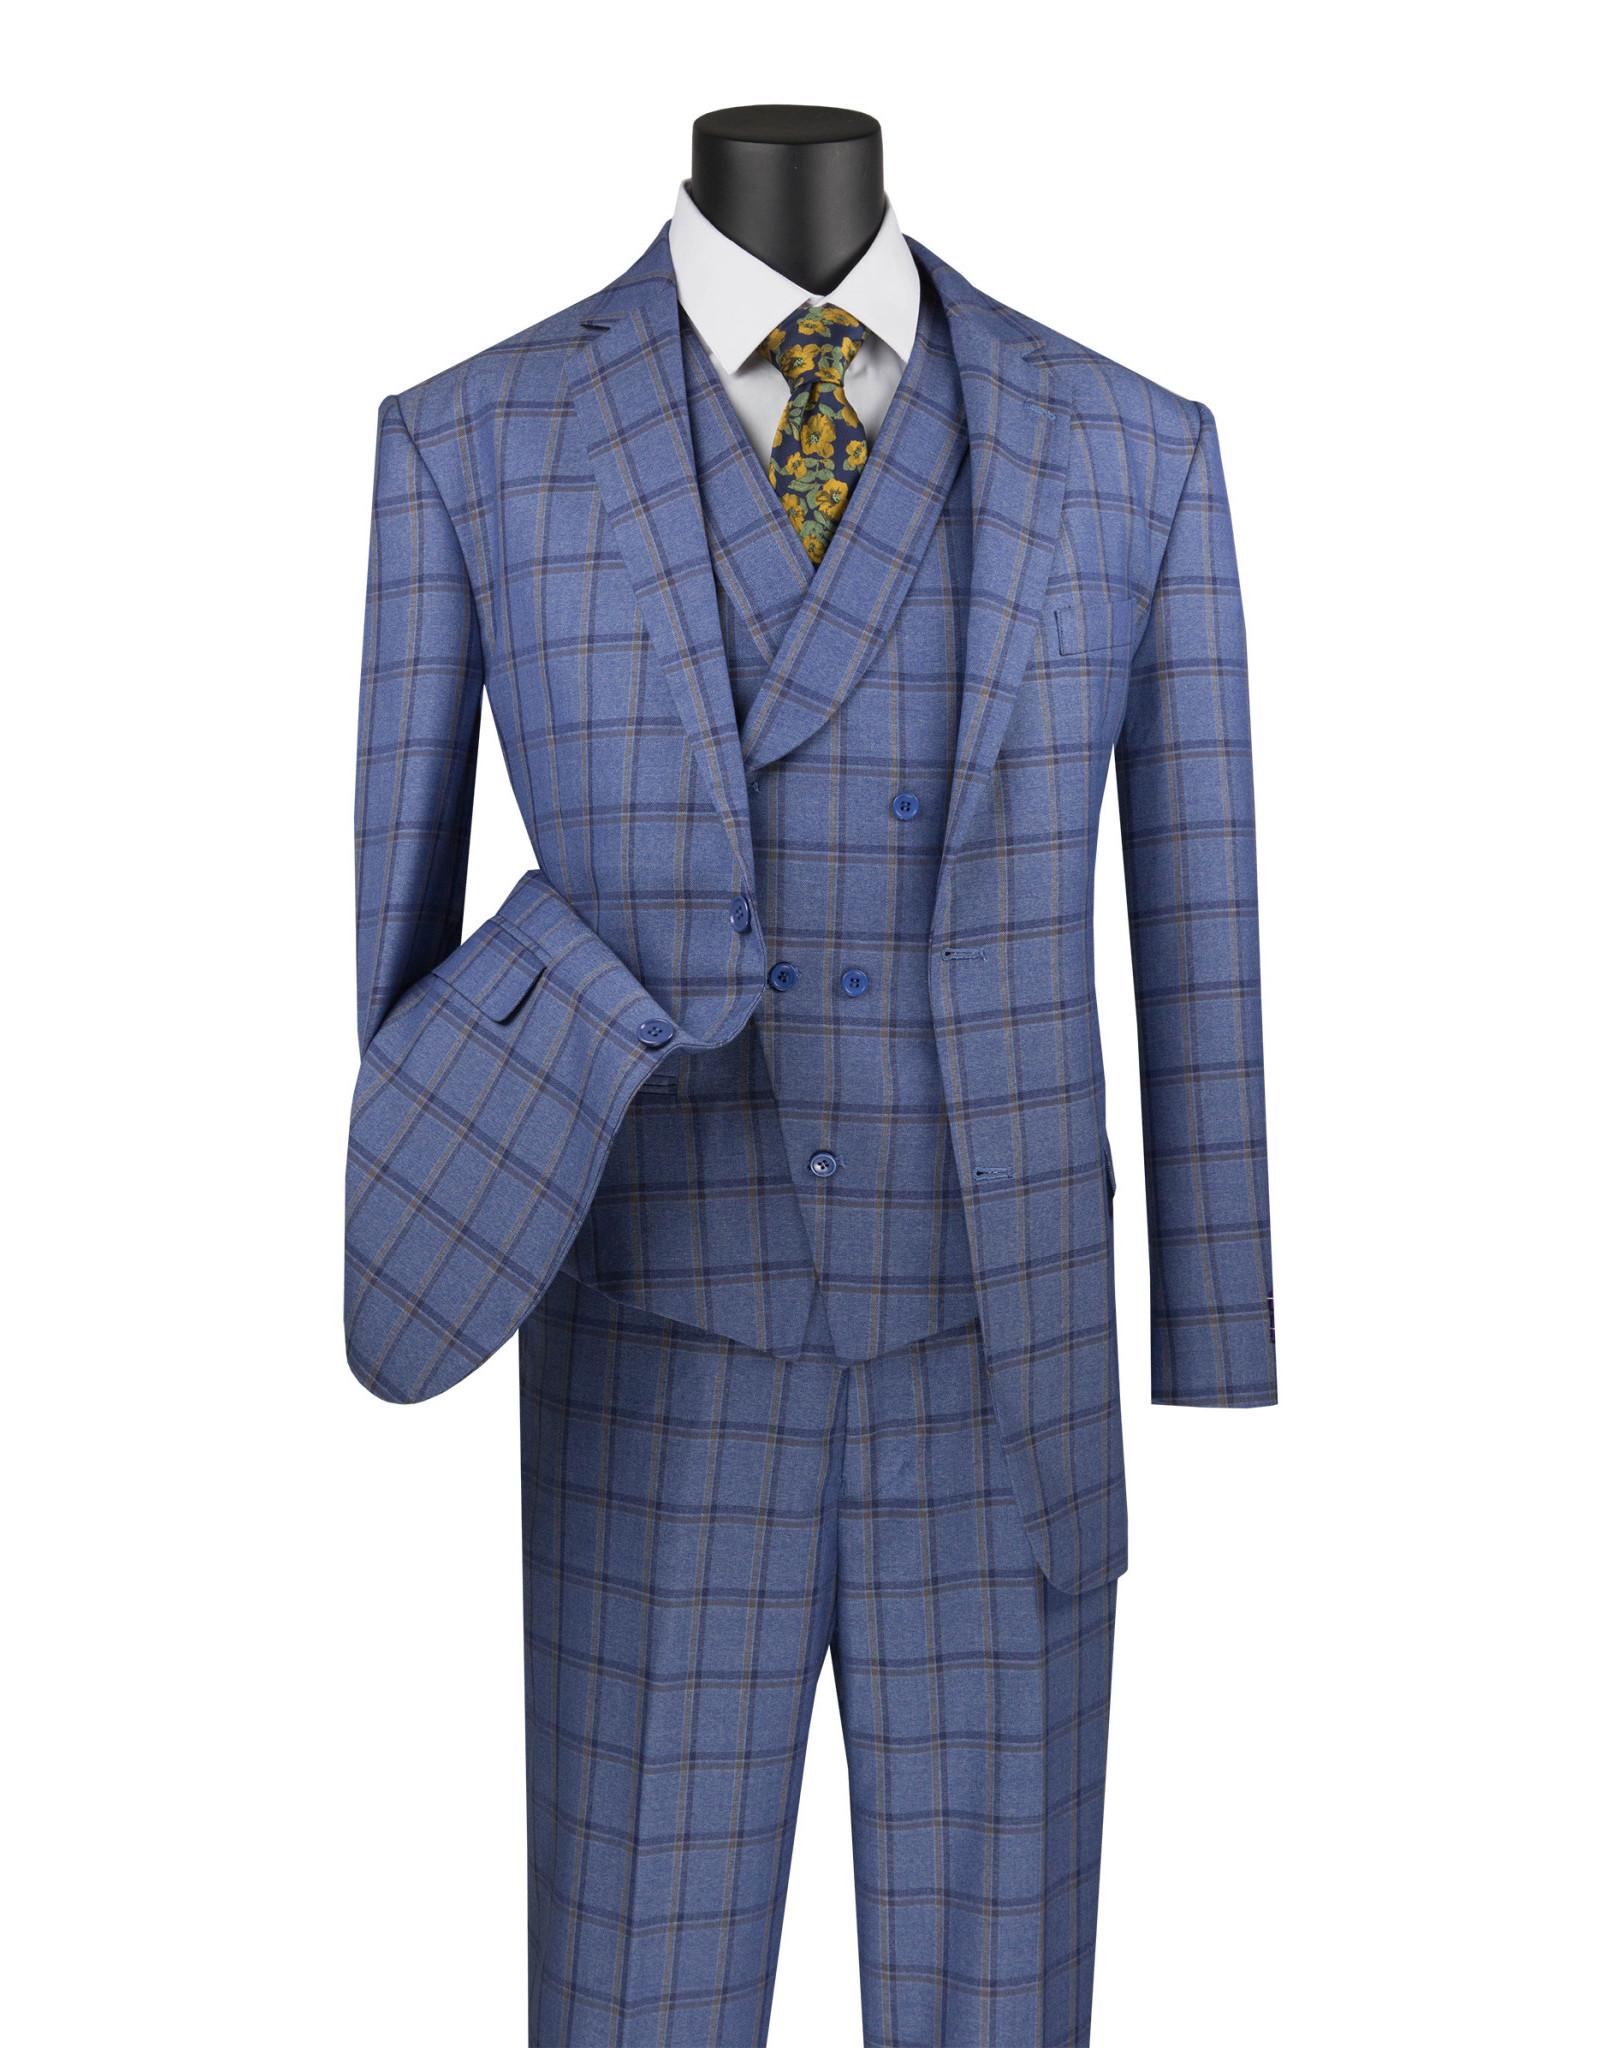 Vinci Vinci Vested Suit - V2RW12 Blue